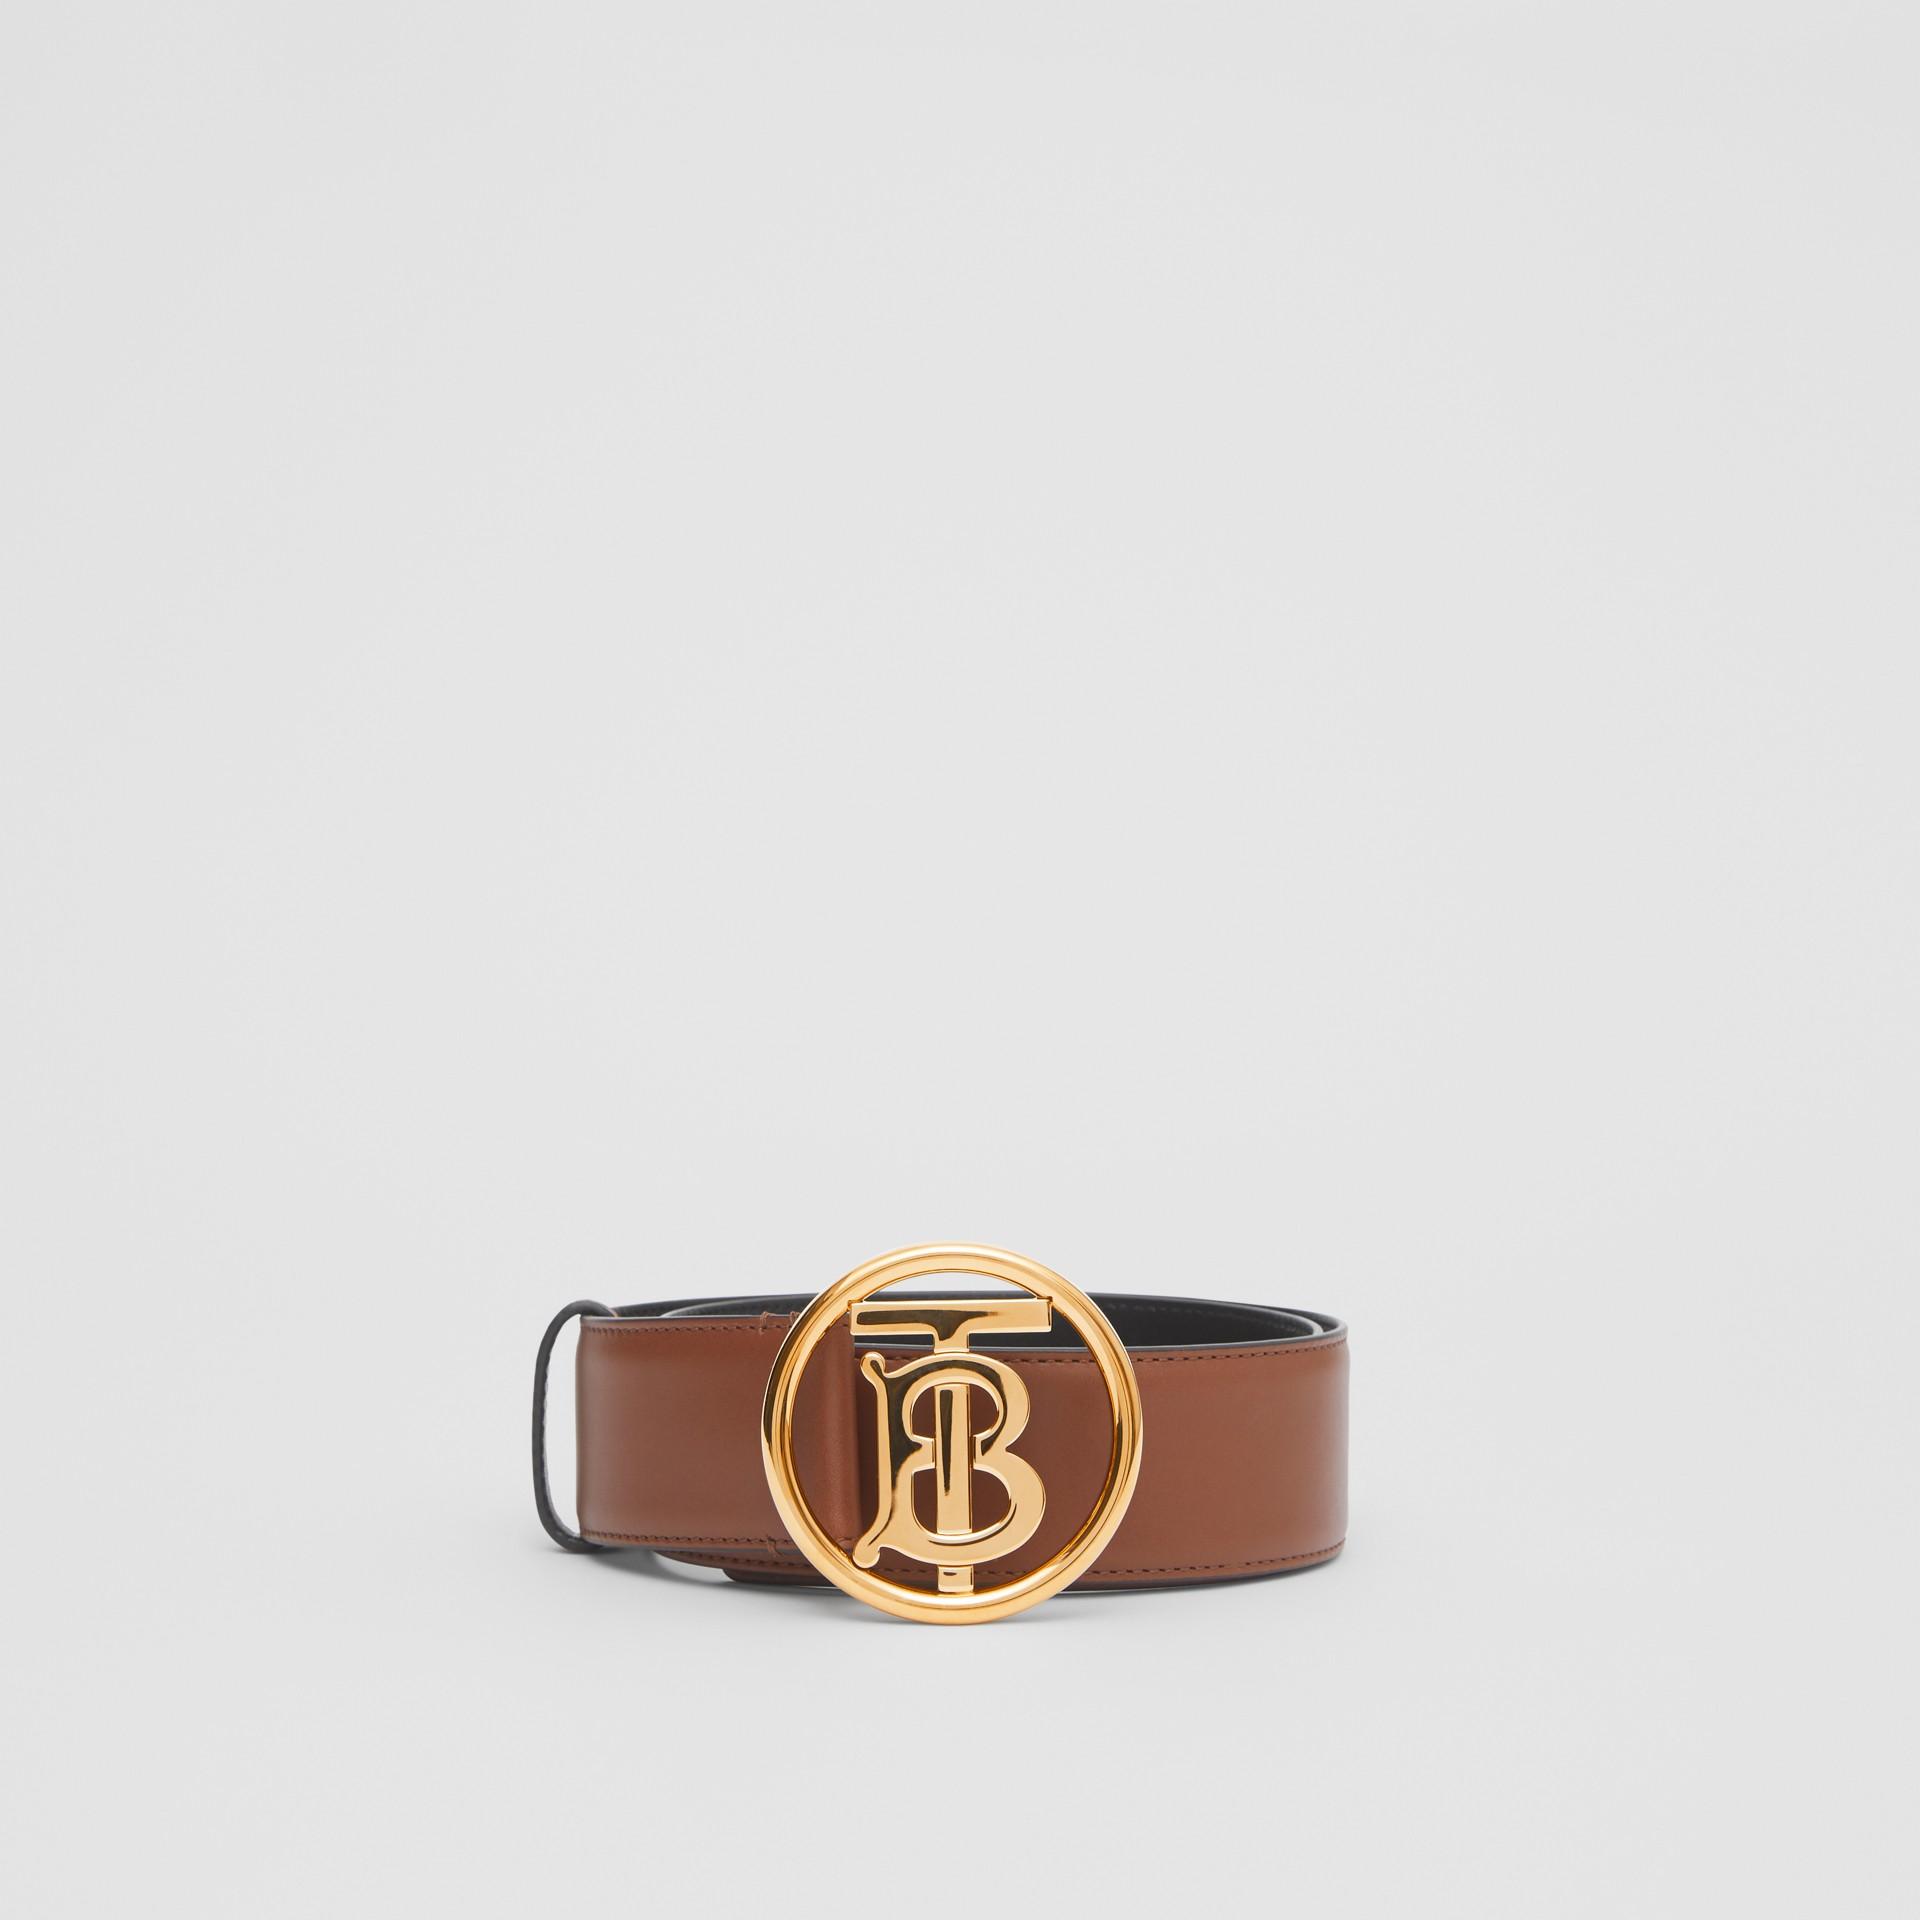 Monogram Motif Leather Belt in Tan/antique Dark Brass - Women | Burberry Canada - gallery image 2